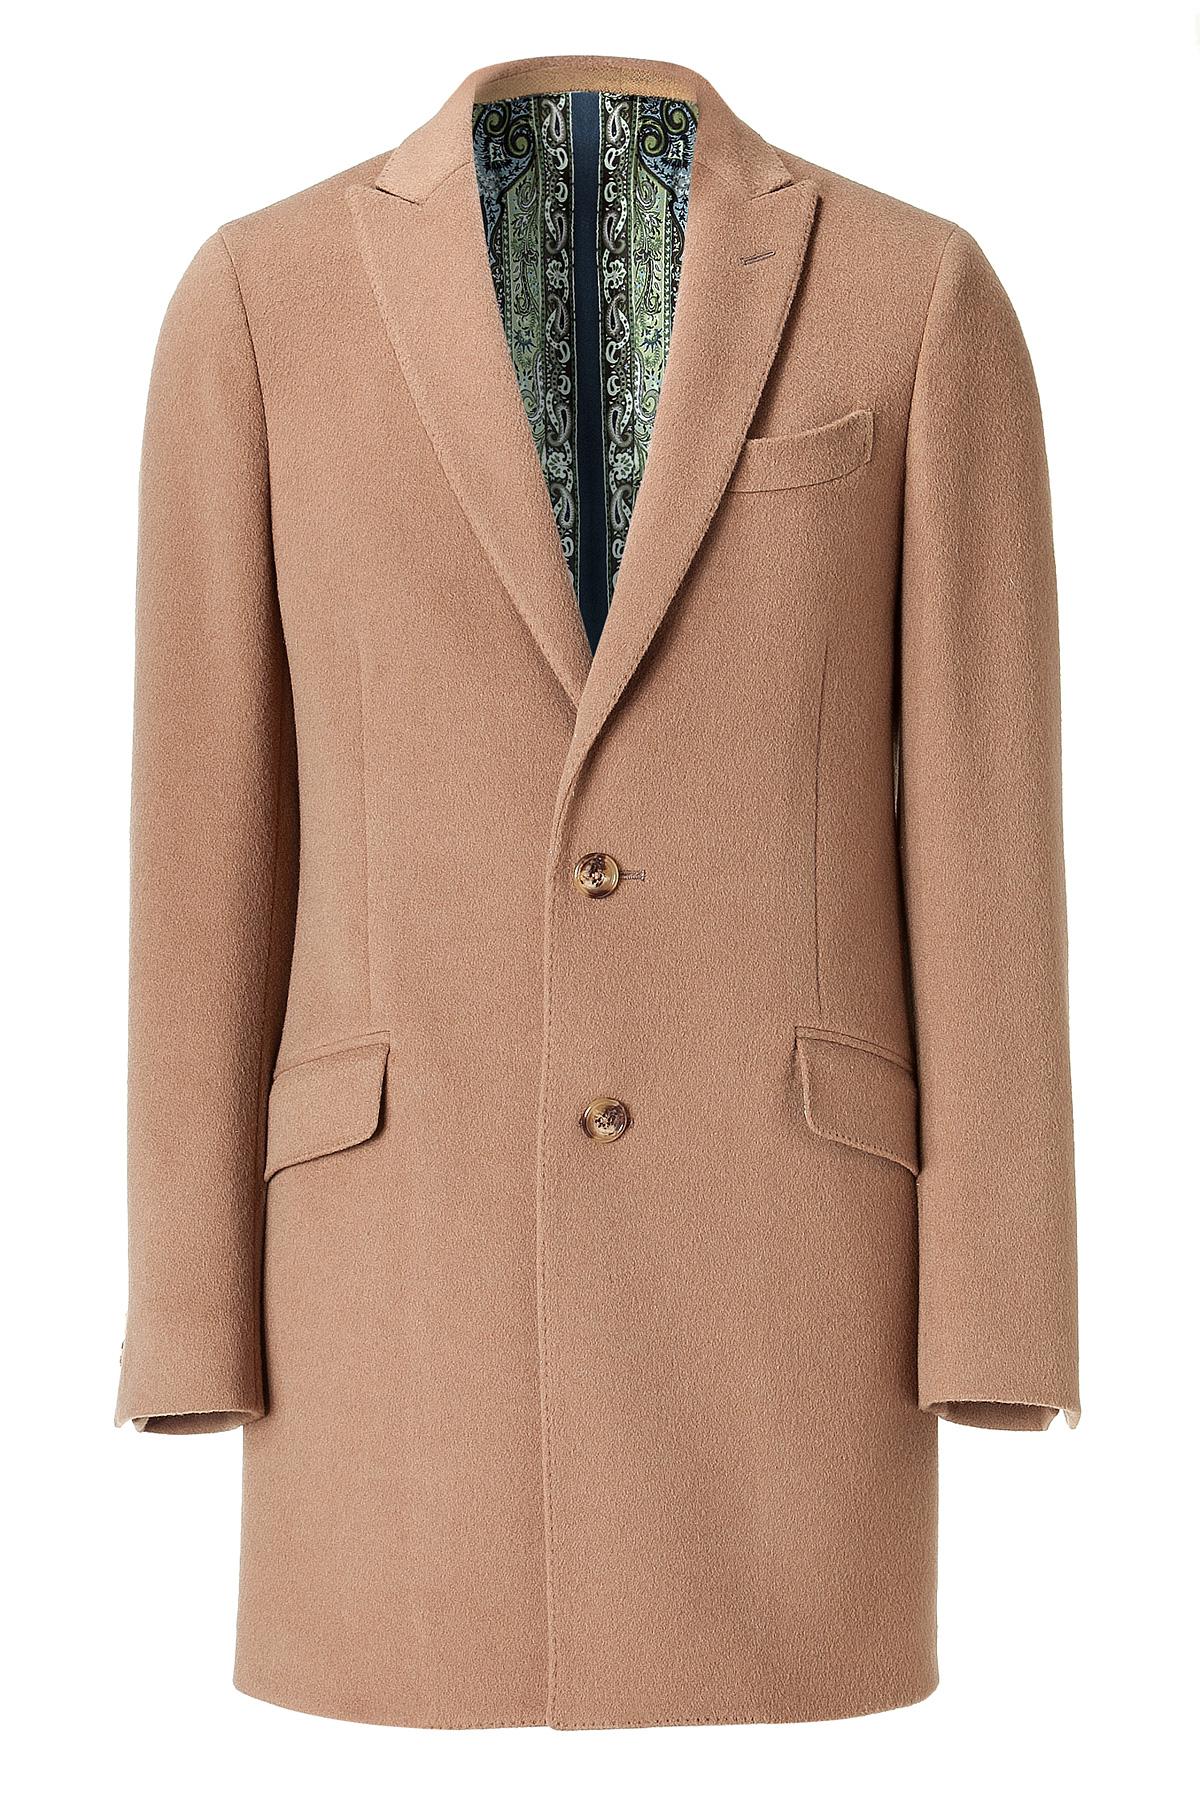 Etro Camel Wool Cashmere Coat in Beige for Men (camel)